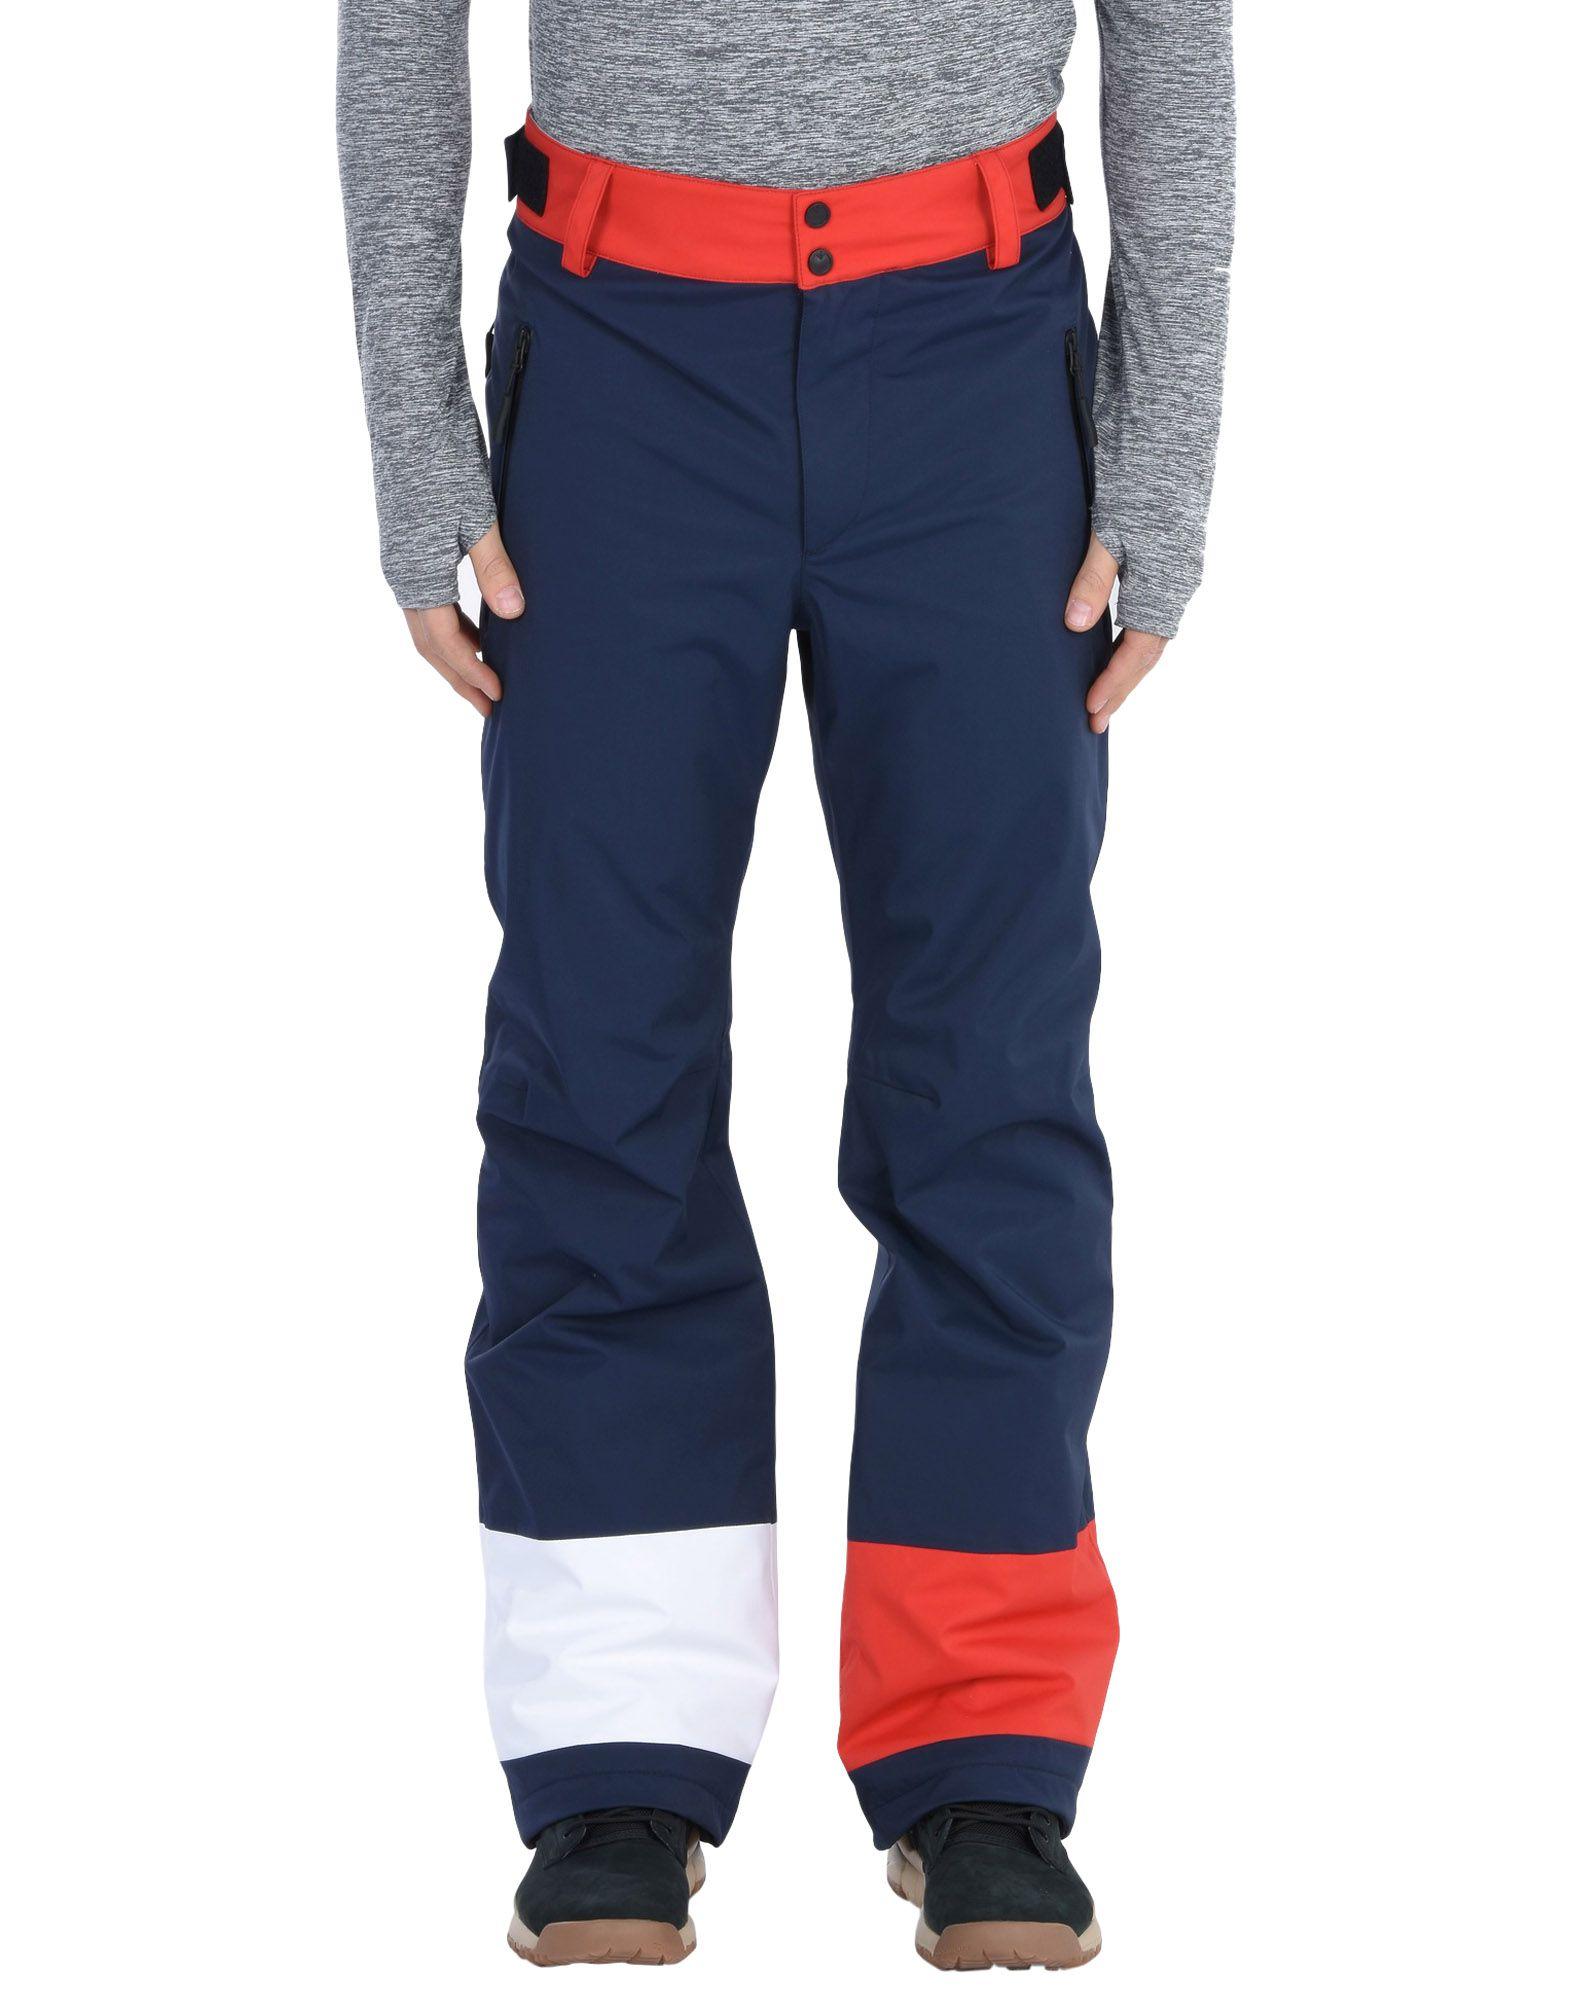 Pantalone Pant Hilfiger Ski Roan Sportivo X Uomo su online Acquista Rossignol Tommy 0xZnrwqg0